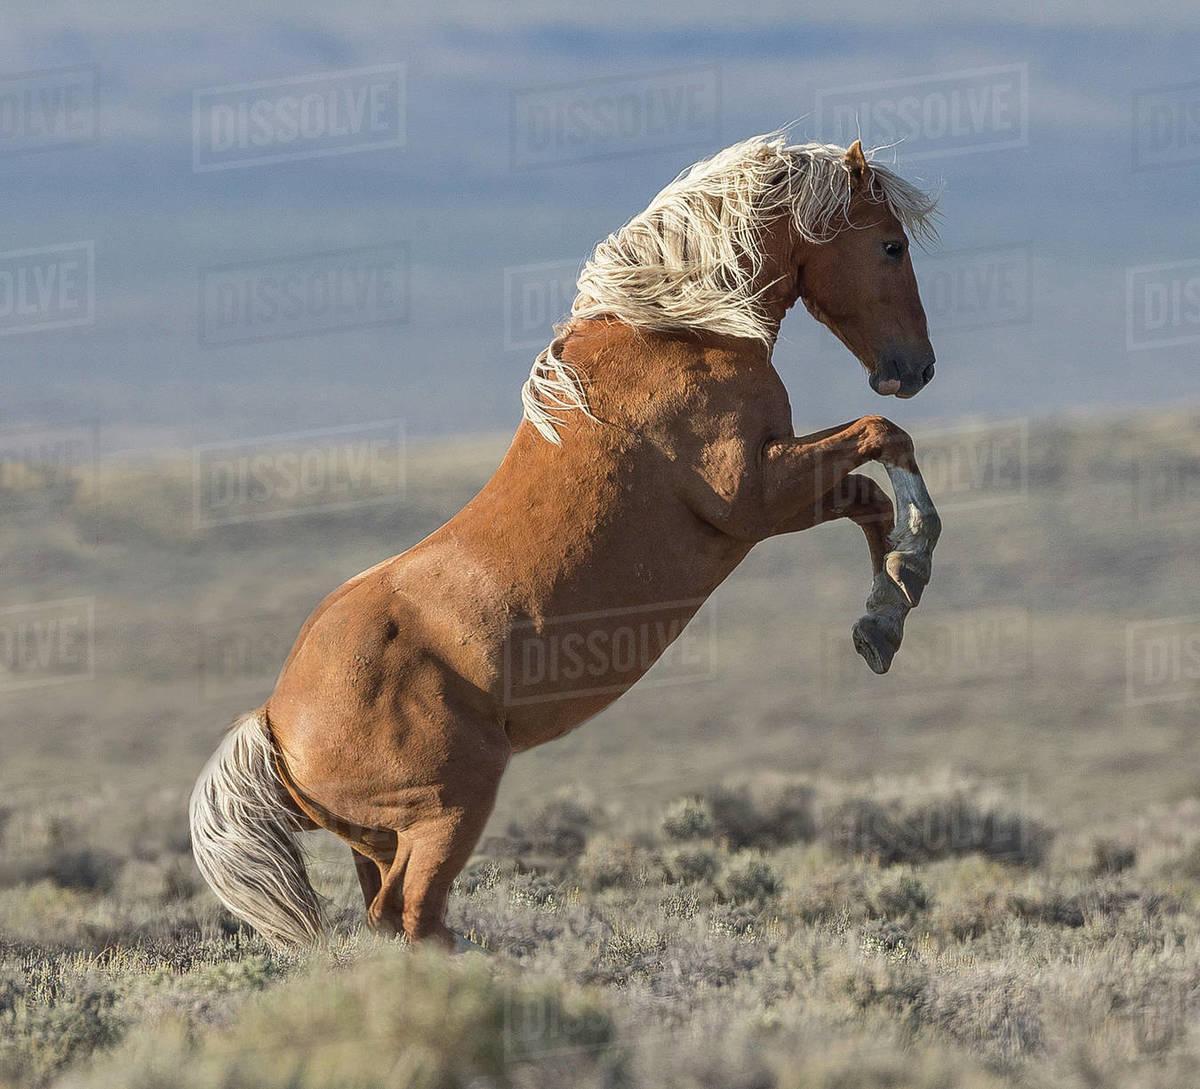 Rf Wild Mustang Palomino Stallion Rearing White Mountain Wyoming Usa August Stock Photo Dissolve